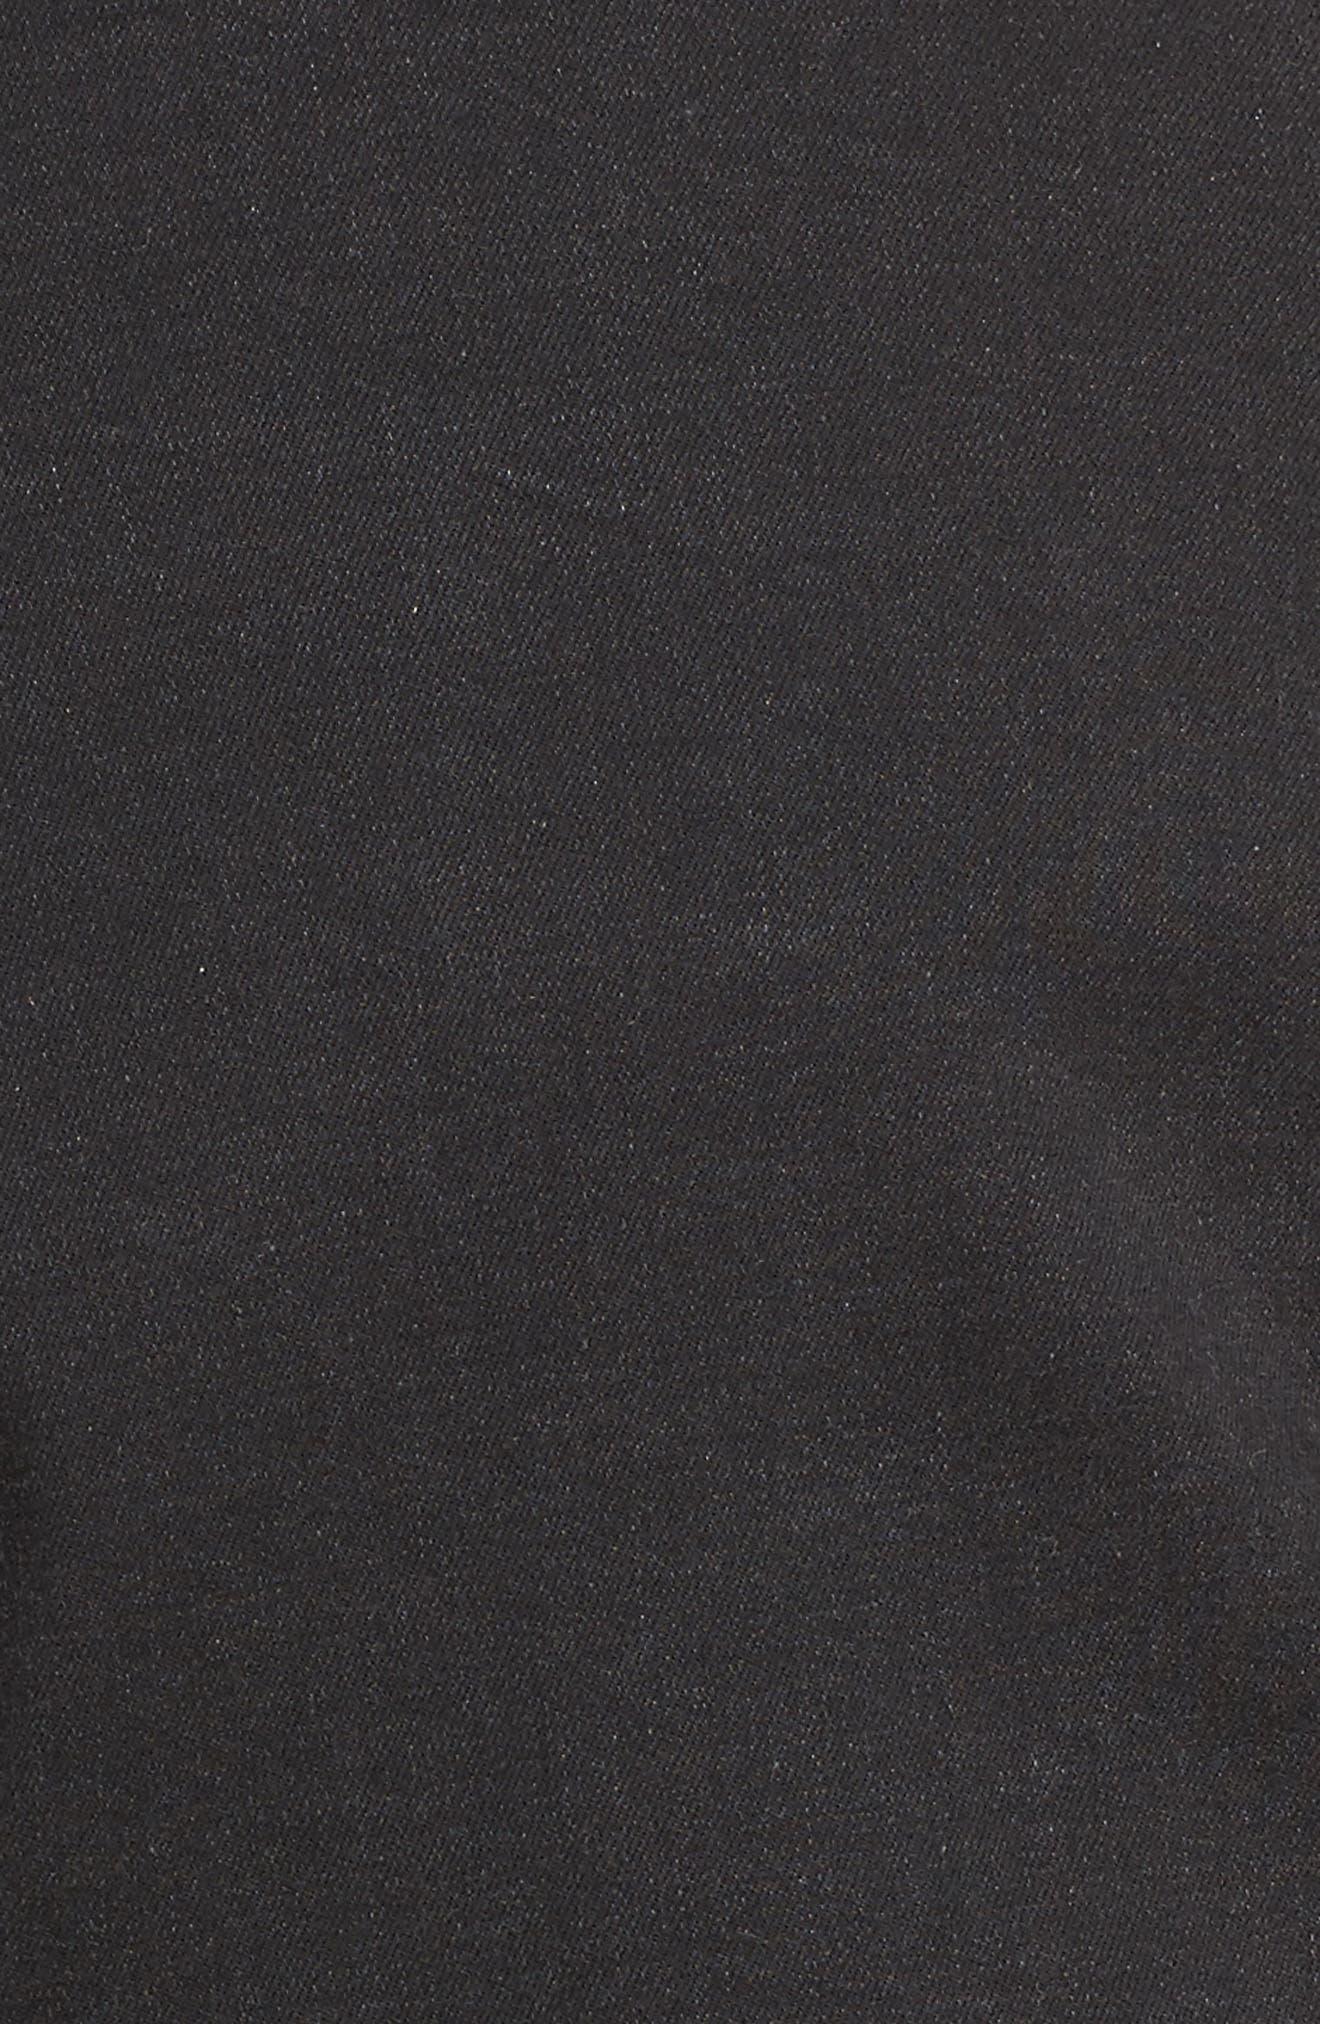 Katinka Denim Jacket,                             Alternate thumbnail 5, color,                             Black